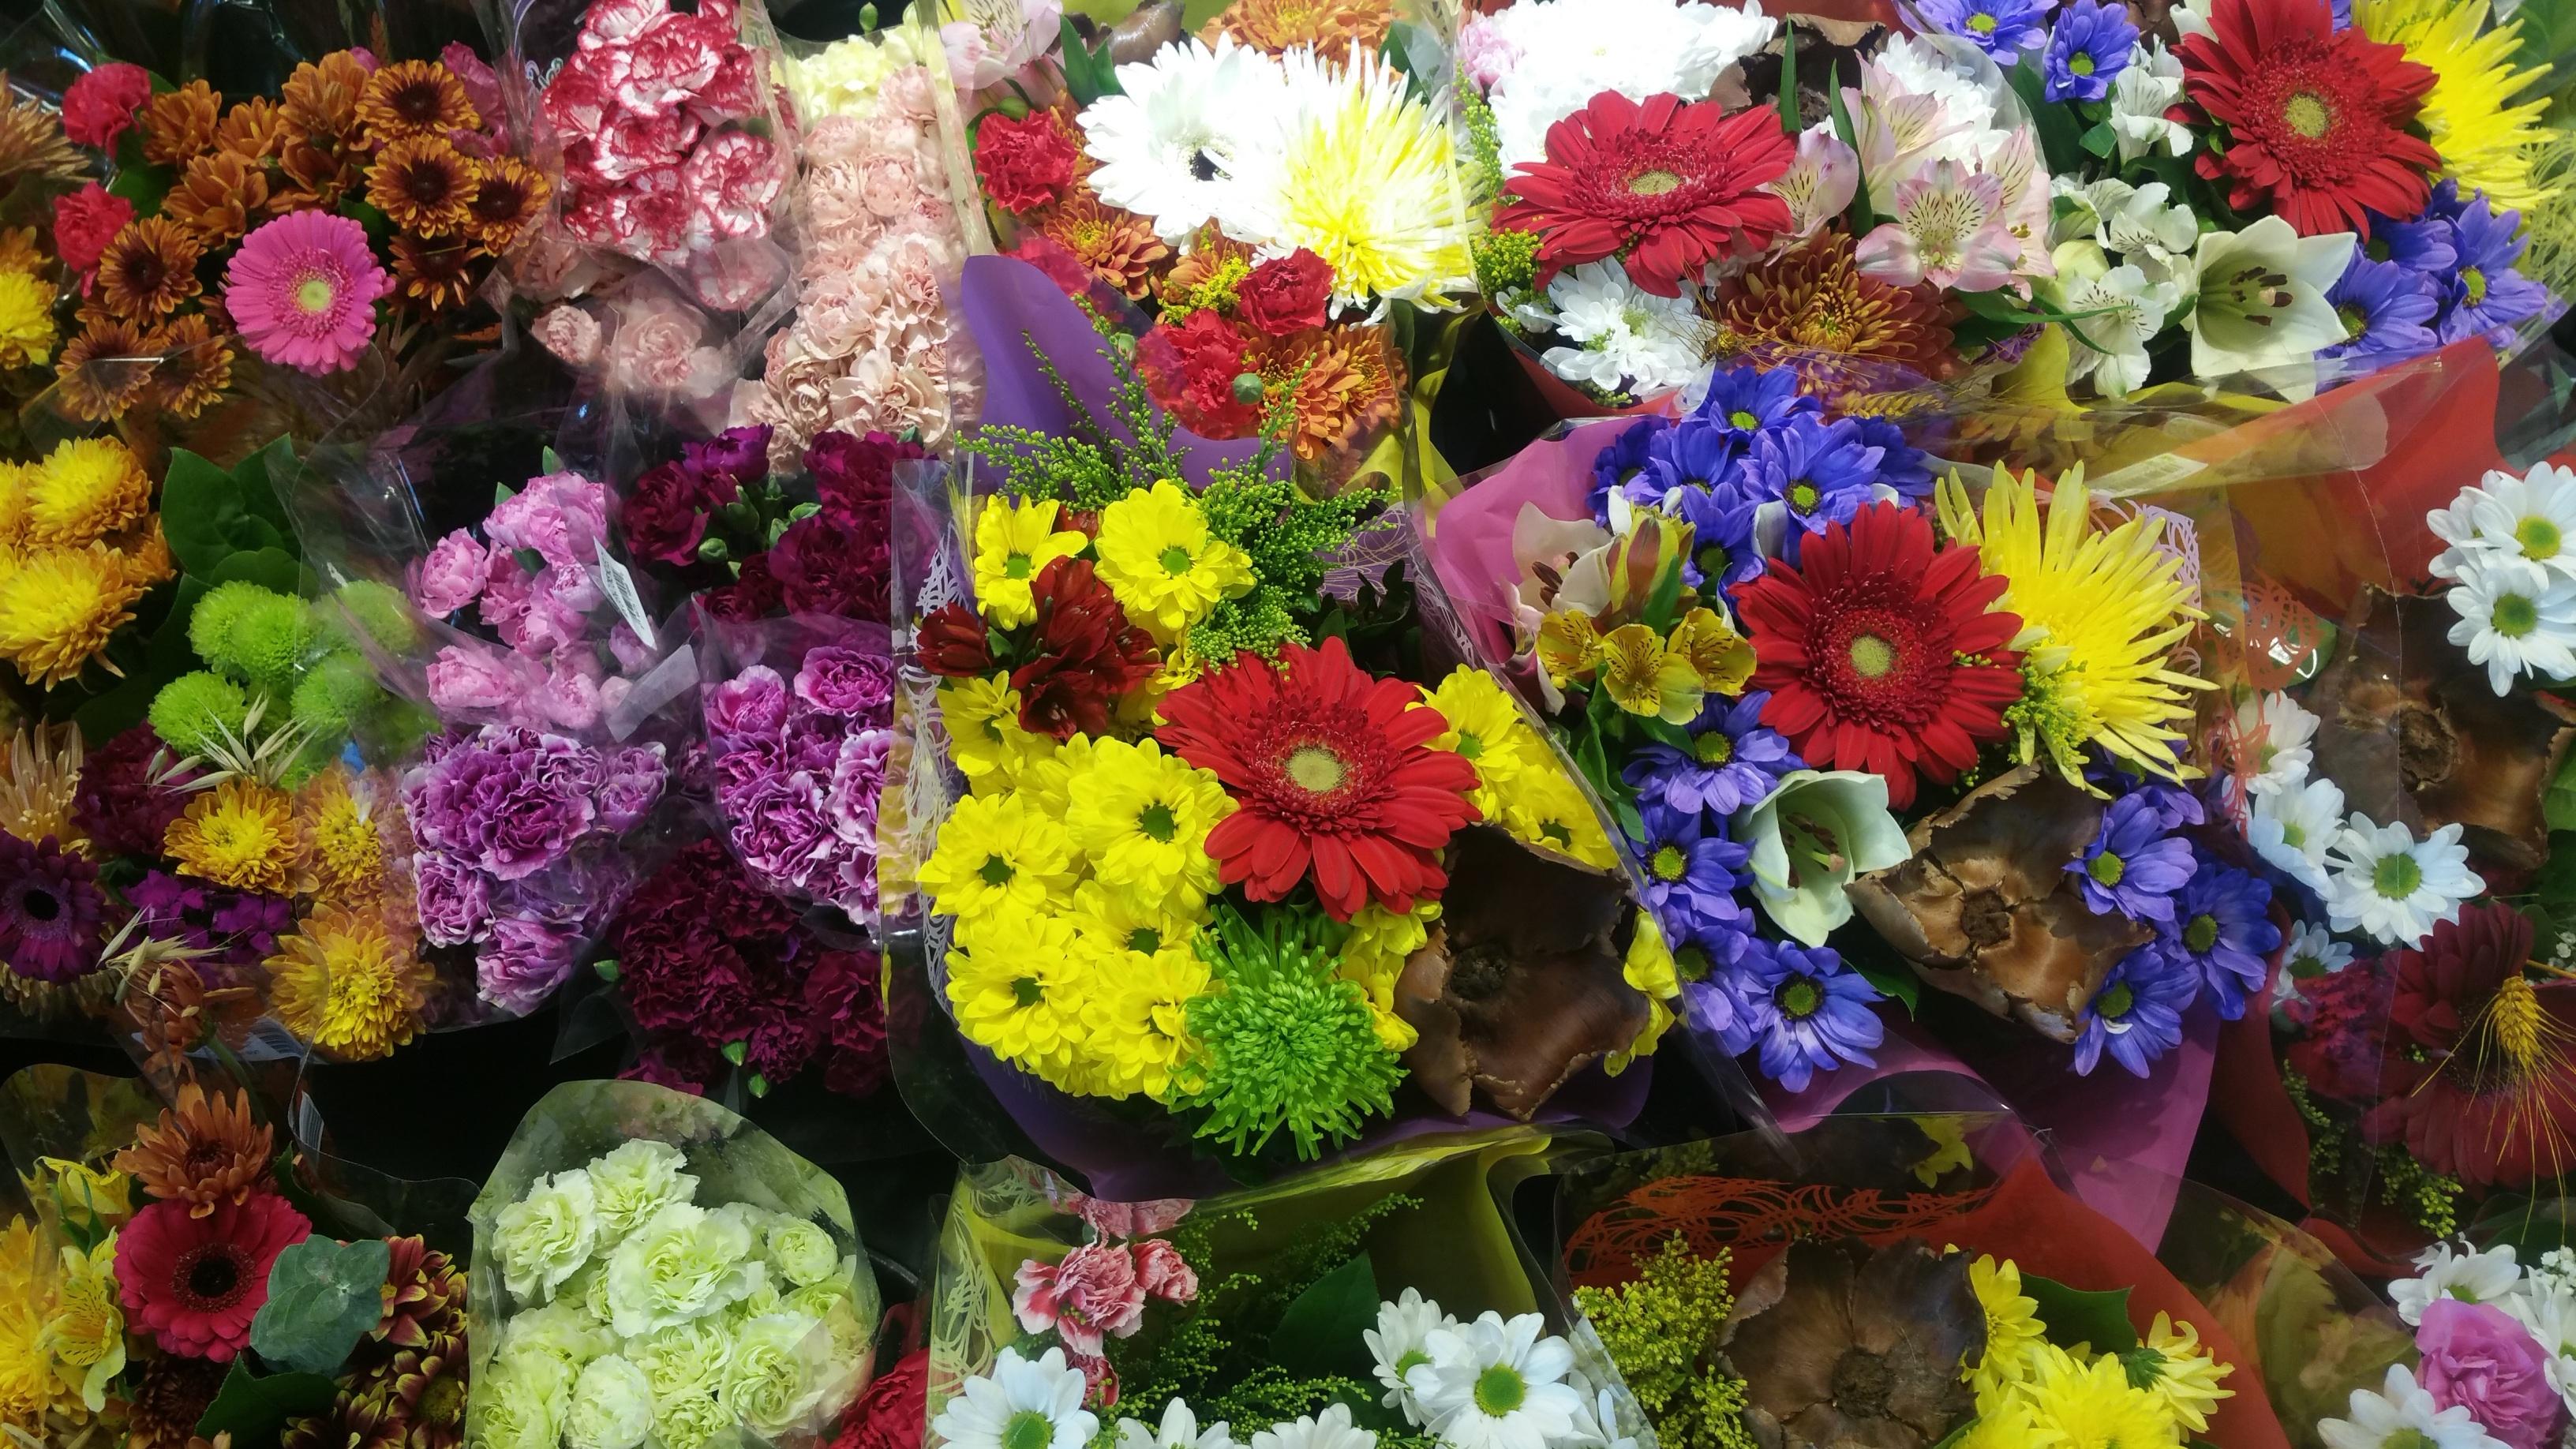 Free Images Flora Flower Arrangement Wildflower Floristry